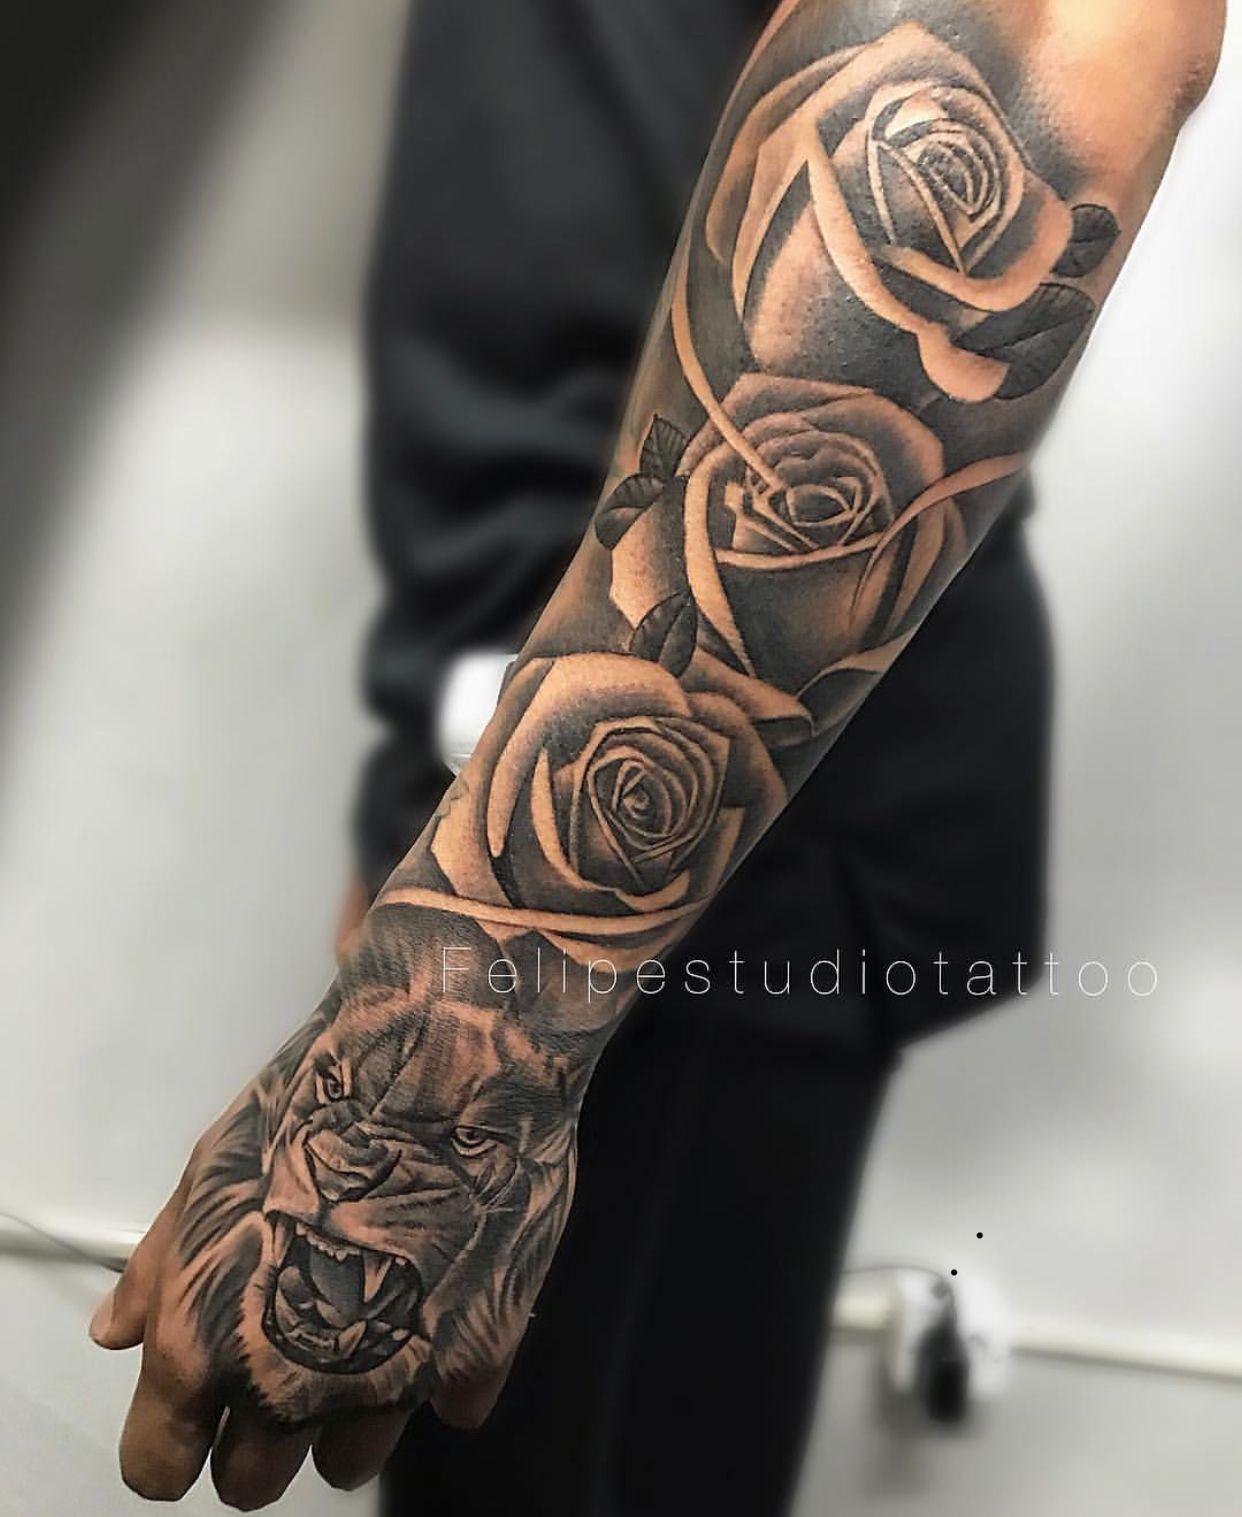 Boby Tatu Rose Tattoo Sleeve Forearm Tattoo Men Tattoos